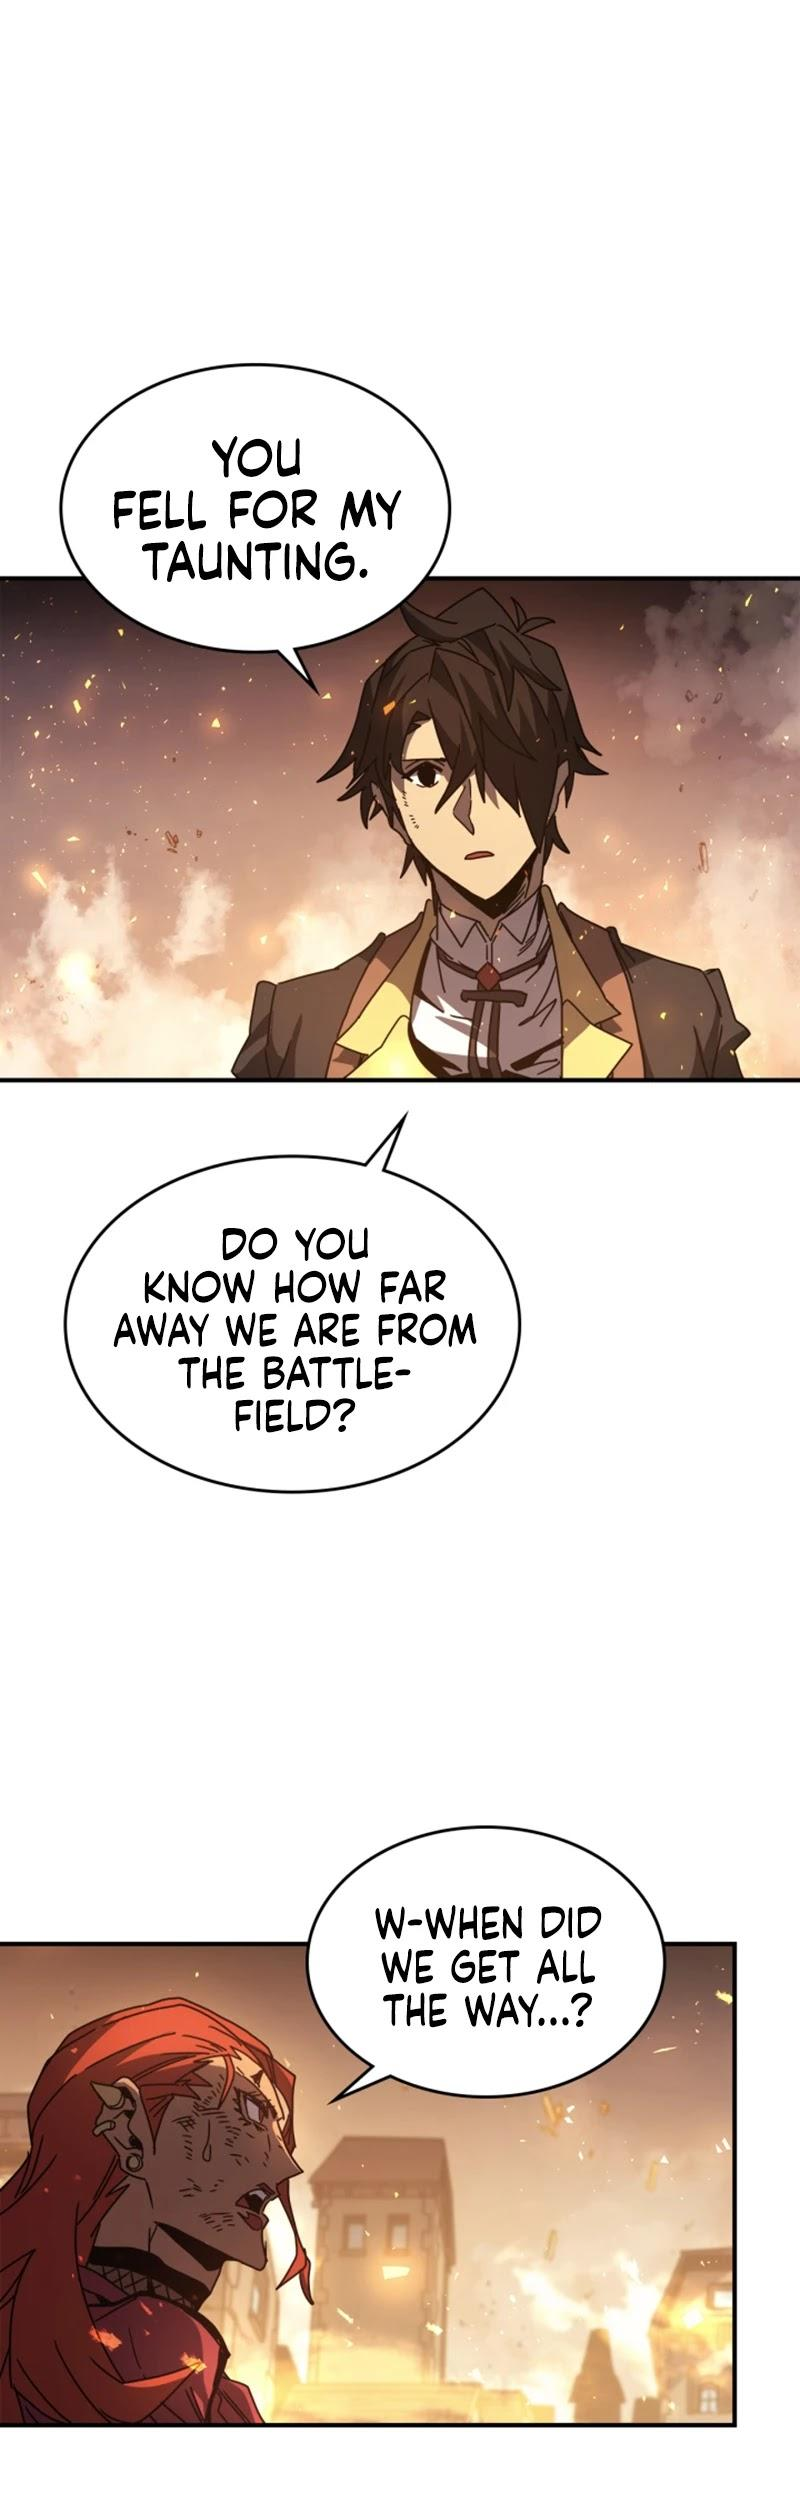 A Returner's Magic Should Be Special Chapter 161 page 32 - Mangakakalot